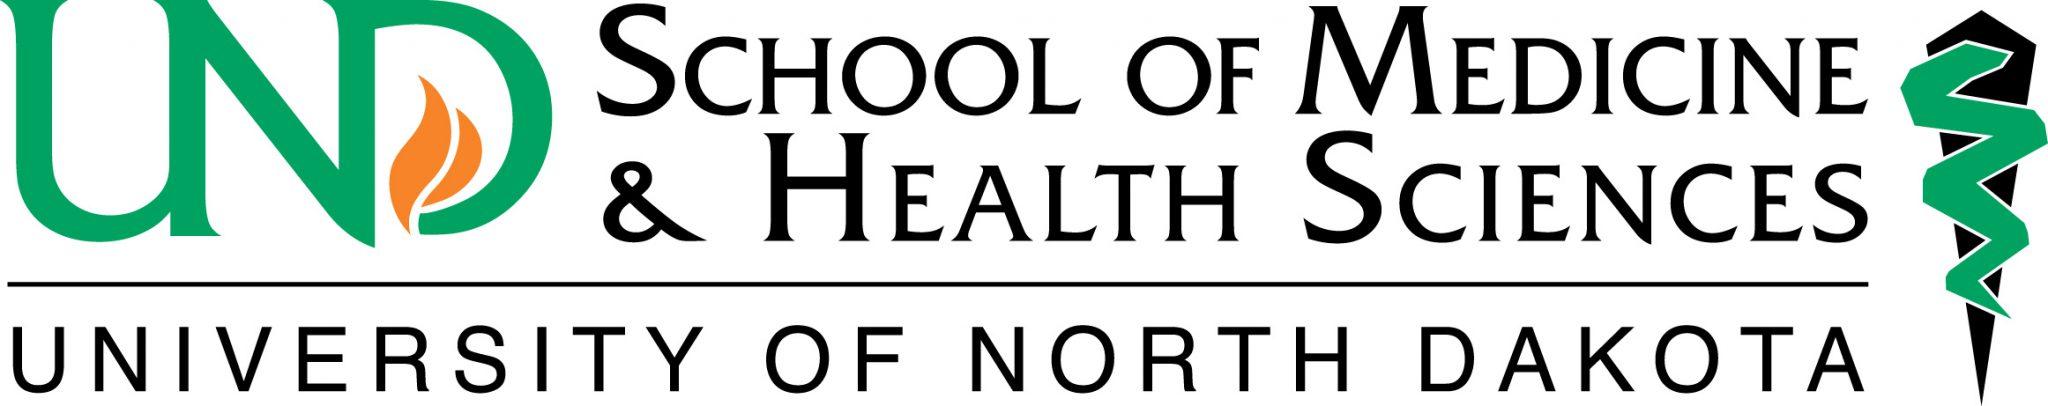 Image result for university of north dakota school of medicine